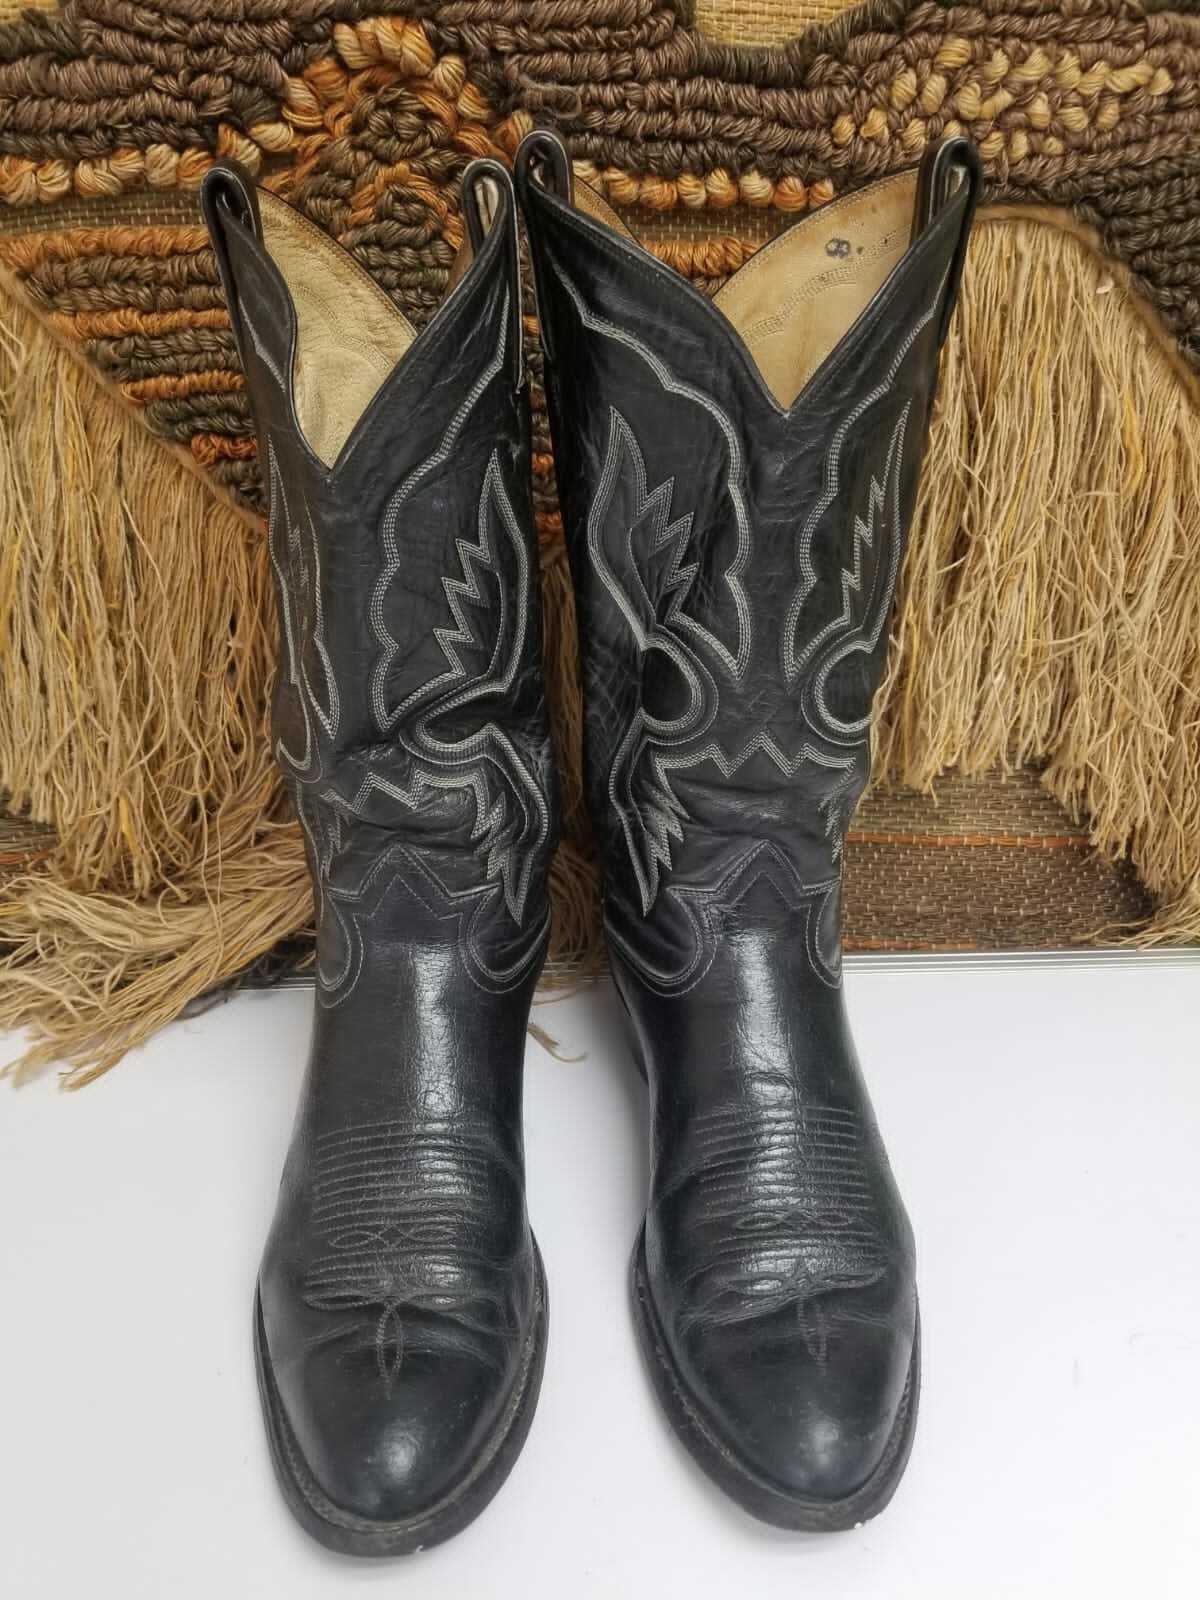 Tony Lama Mens Black Leather Cowboy Western Boots 3513 Size US 9 D